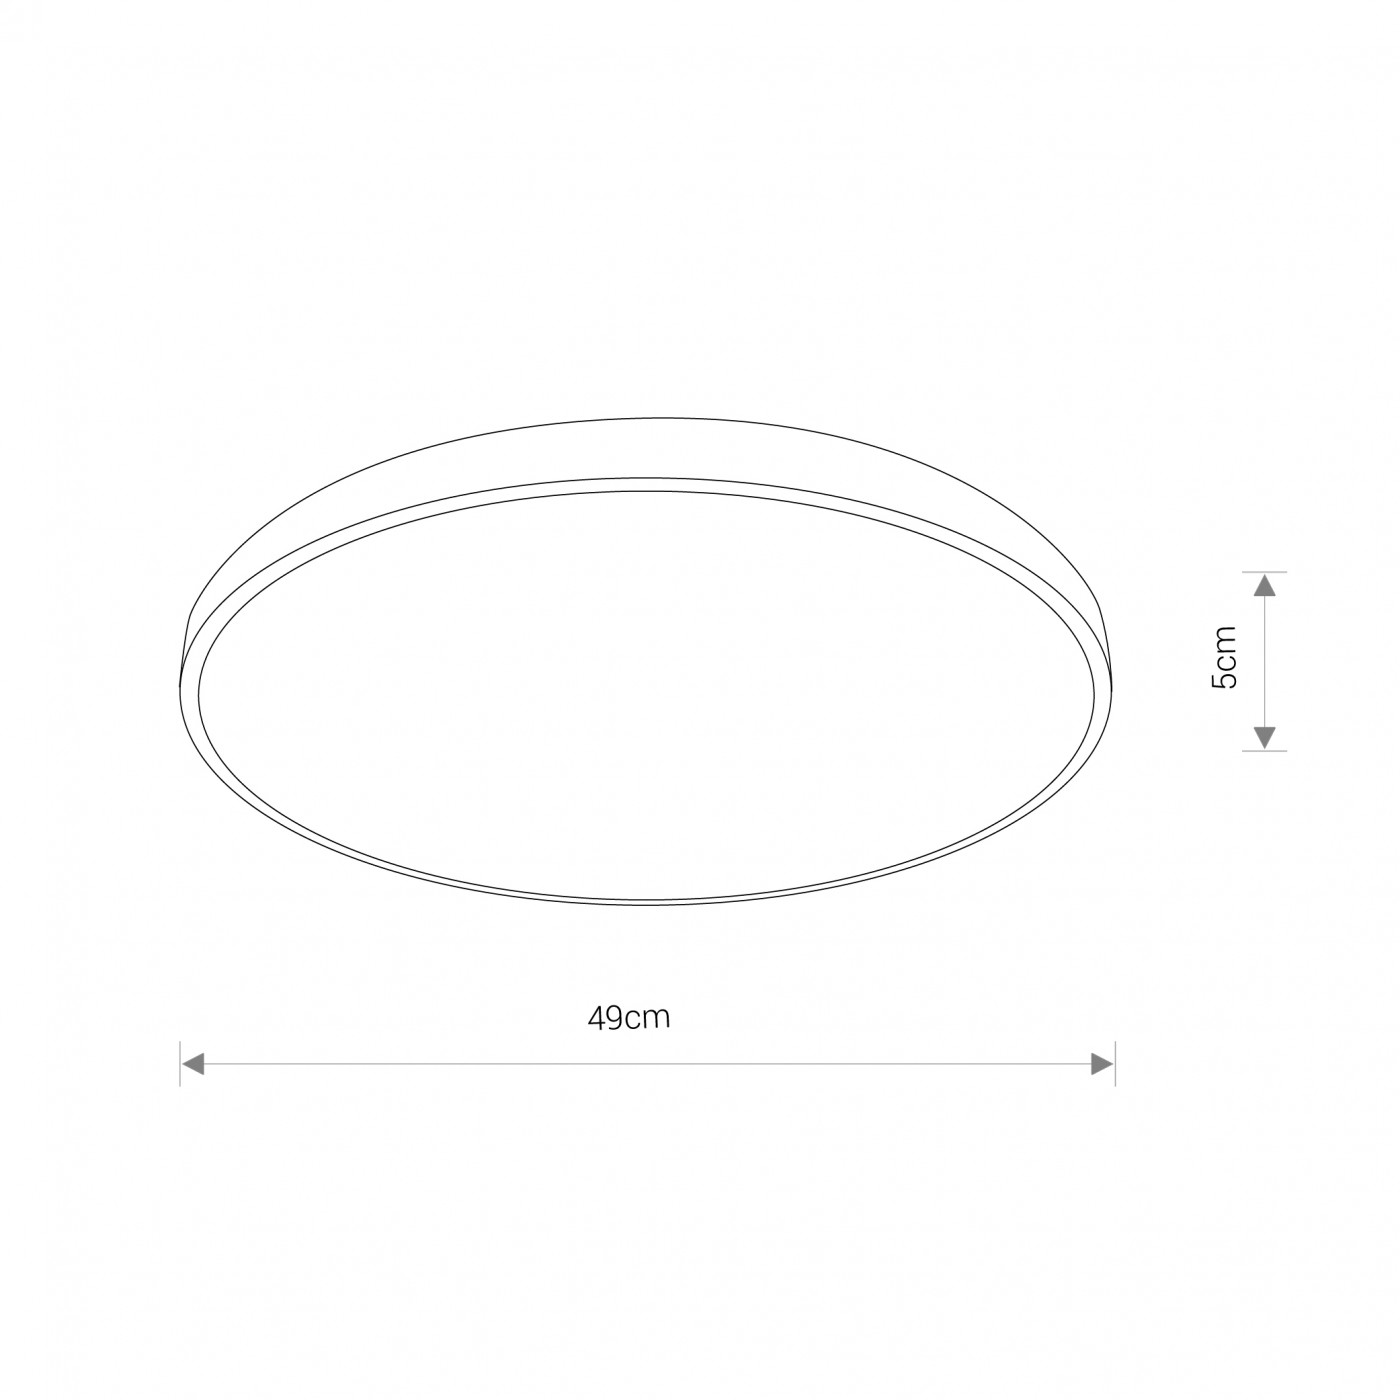 Nowodvorski TL-8205 Agnes Round LED víz-védett mennyezeti lámpa